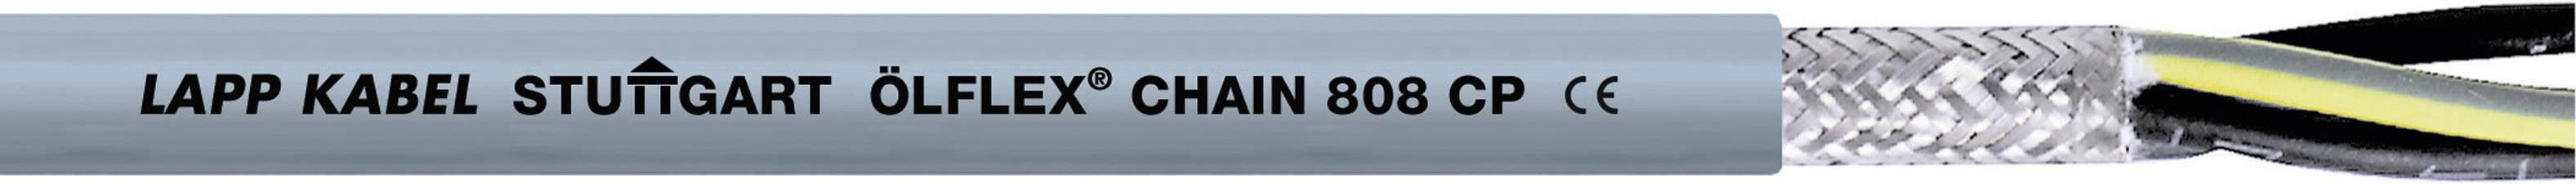 Žíla kabelu LappKabel ÖLFLEX CHAIN 808 CP 2X0,75 (1027759), 2x 0,75 mm², polyurethan, Ø 6,2 mm, stíněný, 50 m,